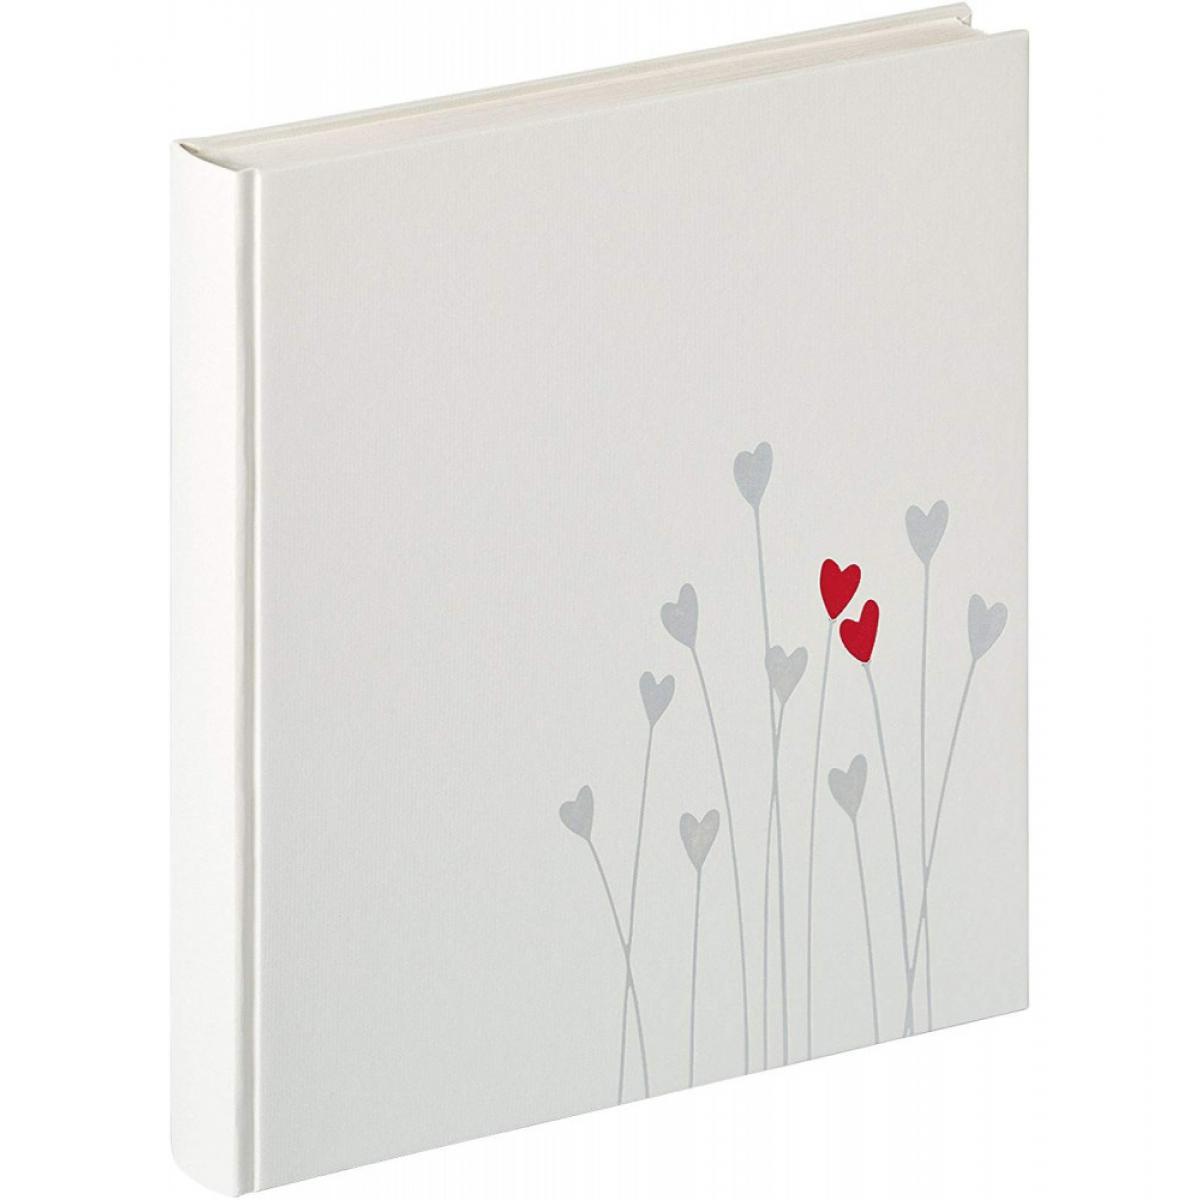 Ac-Deco Album photo de mariage Bleeding Heart - 30,5 x 28 cm - Blanc